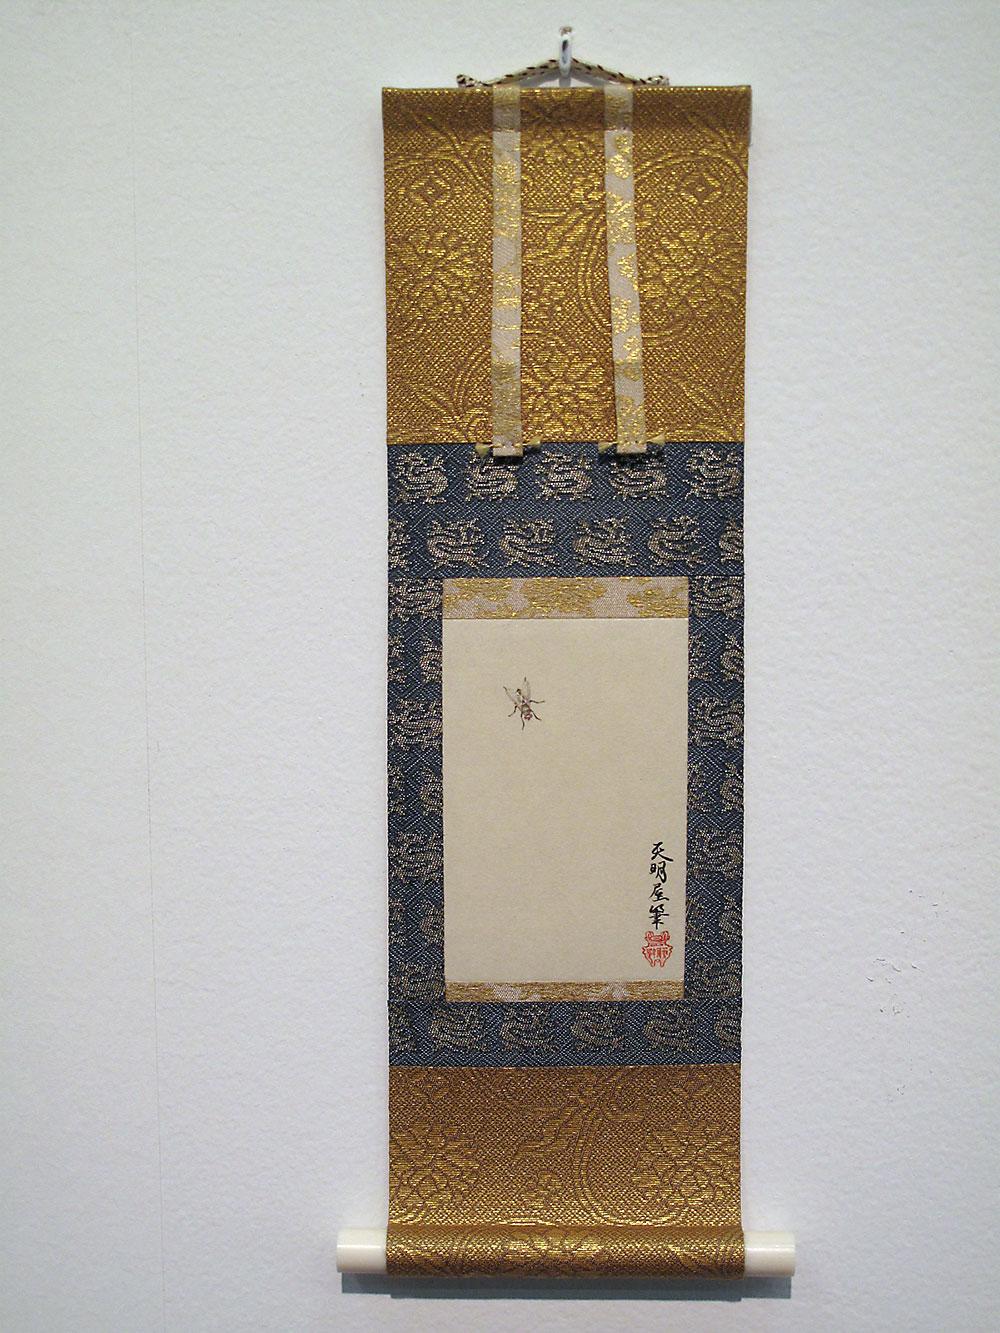 Hisashi Tenmyouya @ Mizuma Art